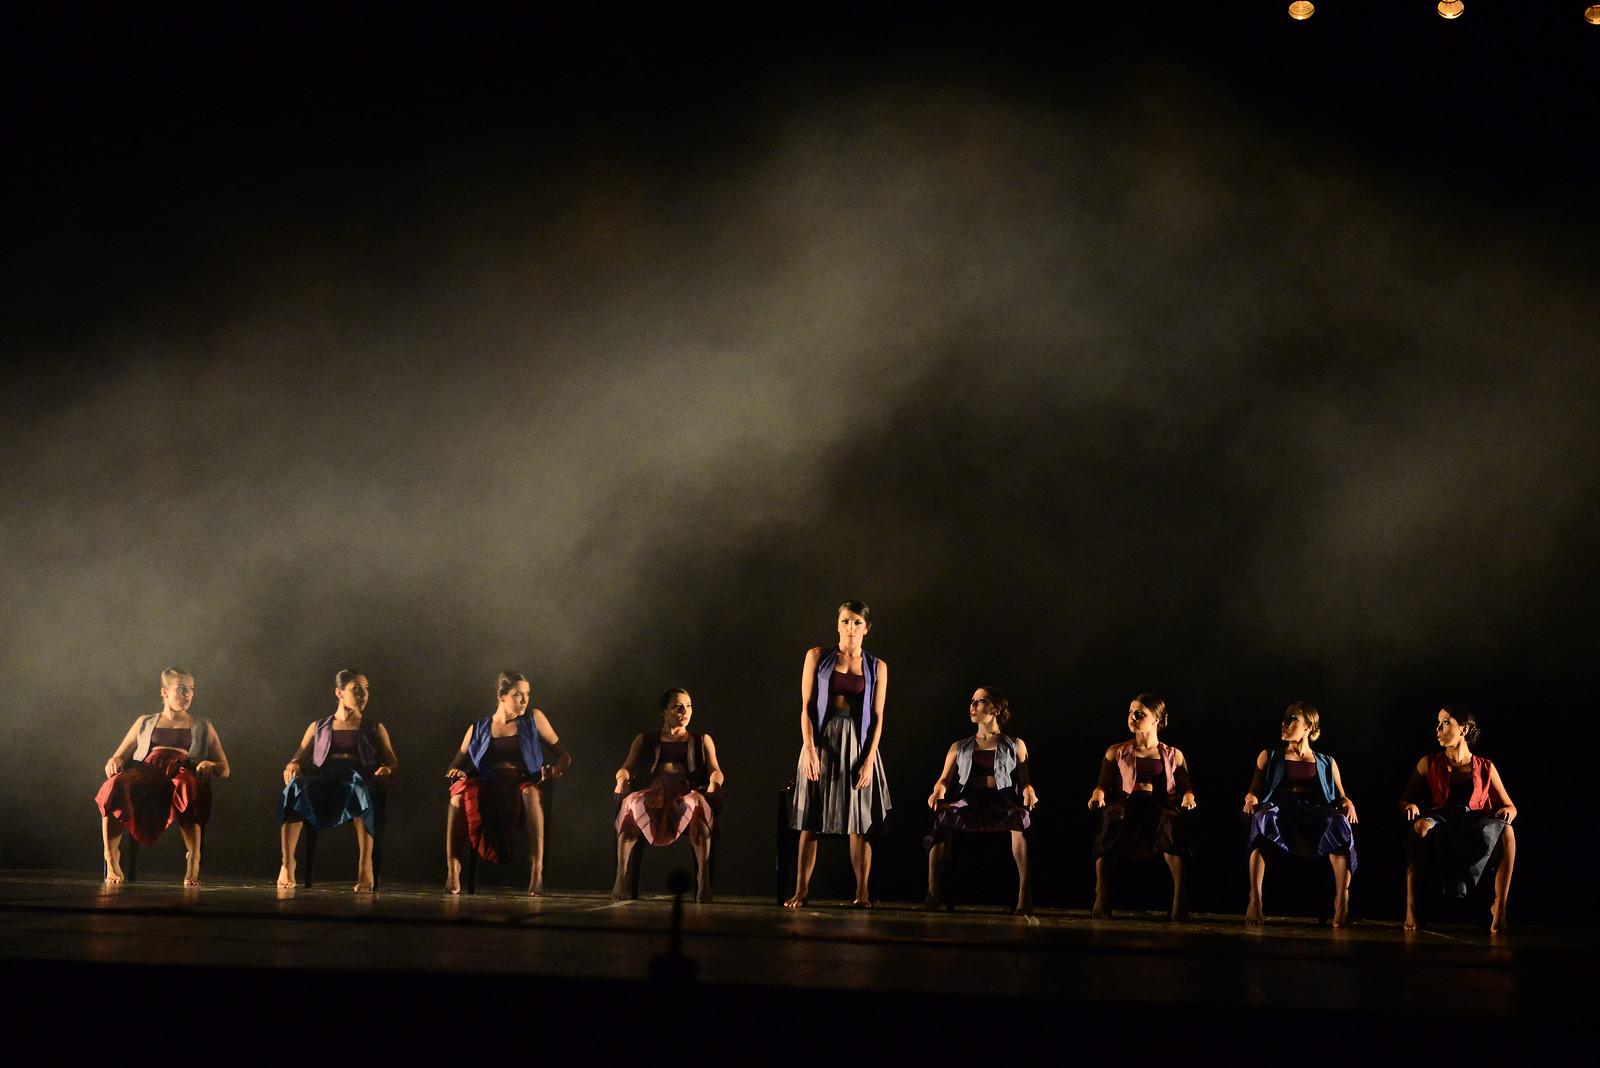 Mostra Competitiva 25.07.2017 - 35º Festival de Dança de Joinville